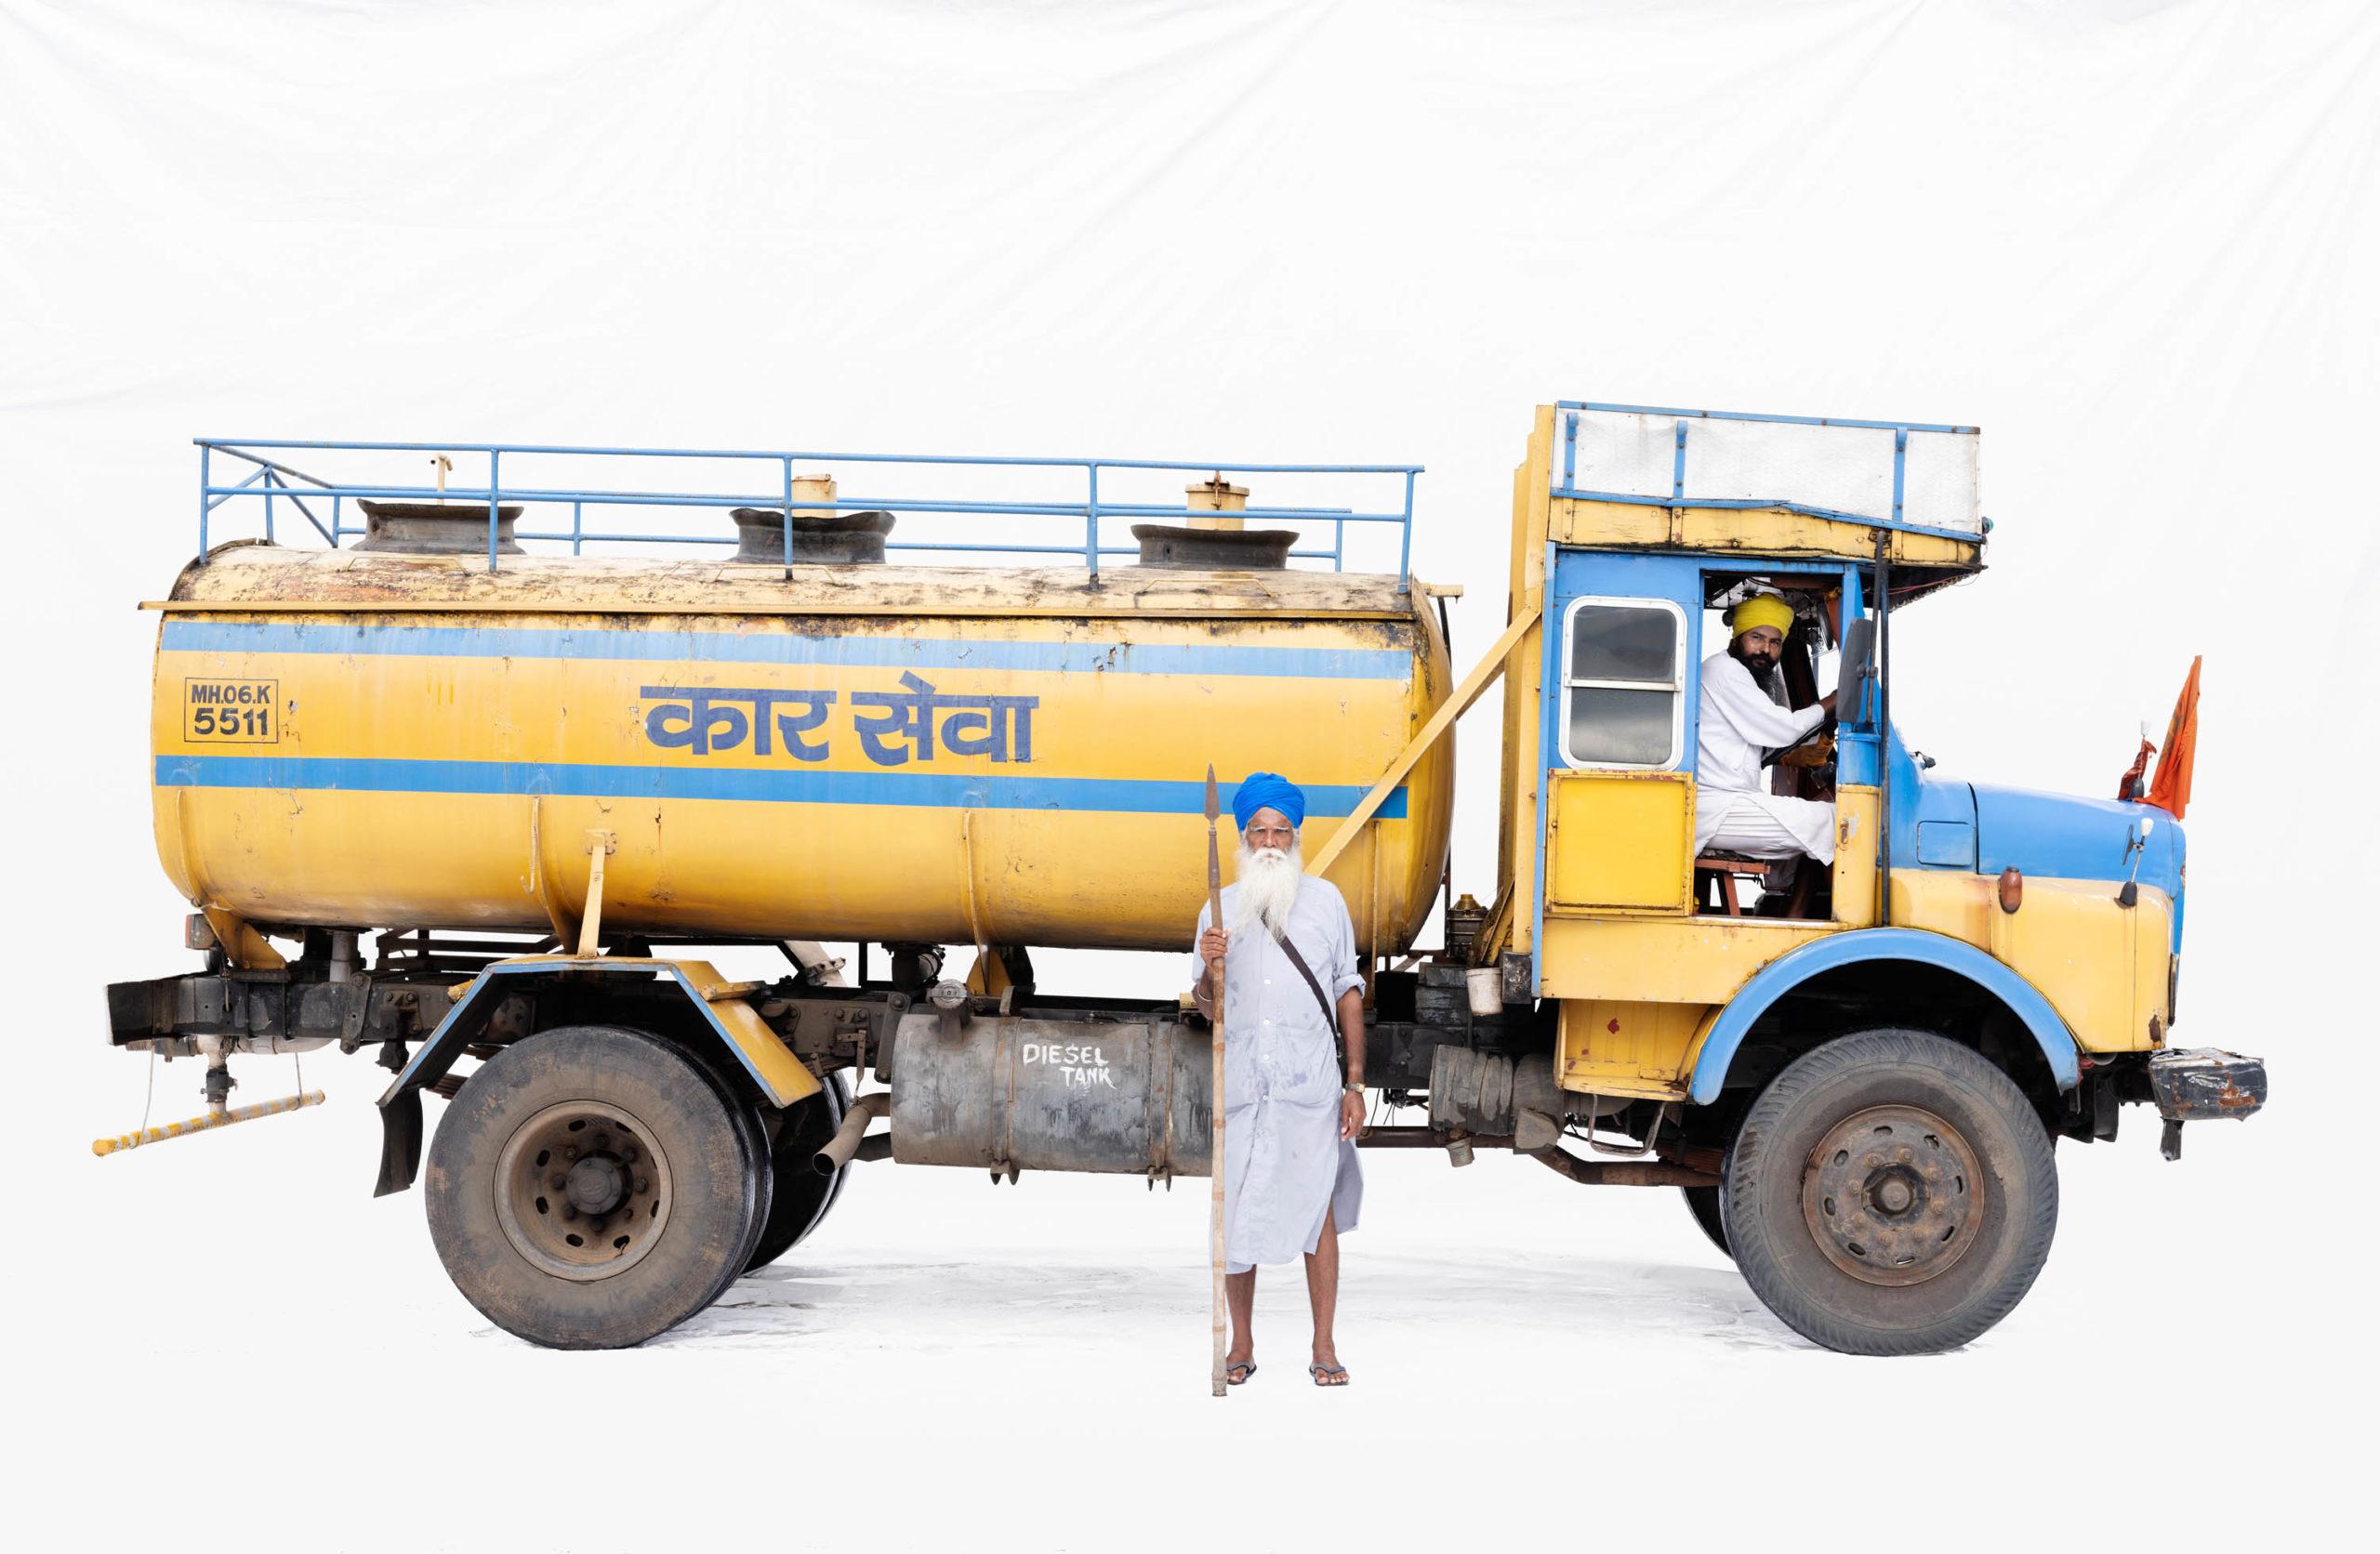 Tata 1613 water tanker; Truck driver Harpal Singh, guard Tail Singh (Asangaon, Maharashtra)